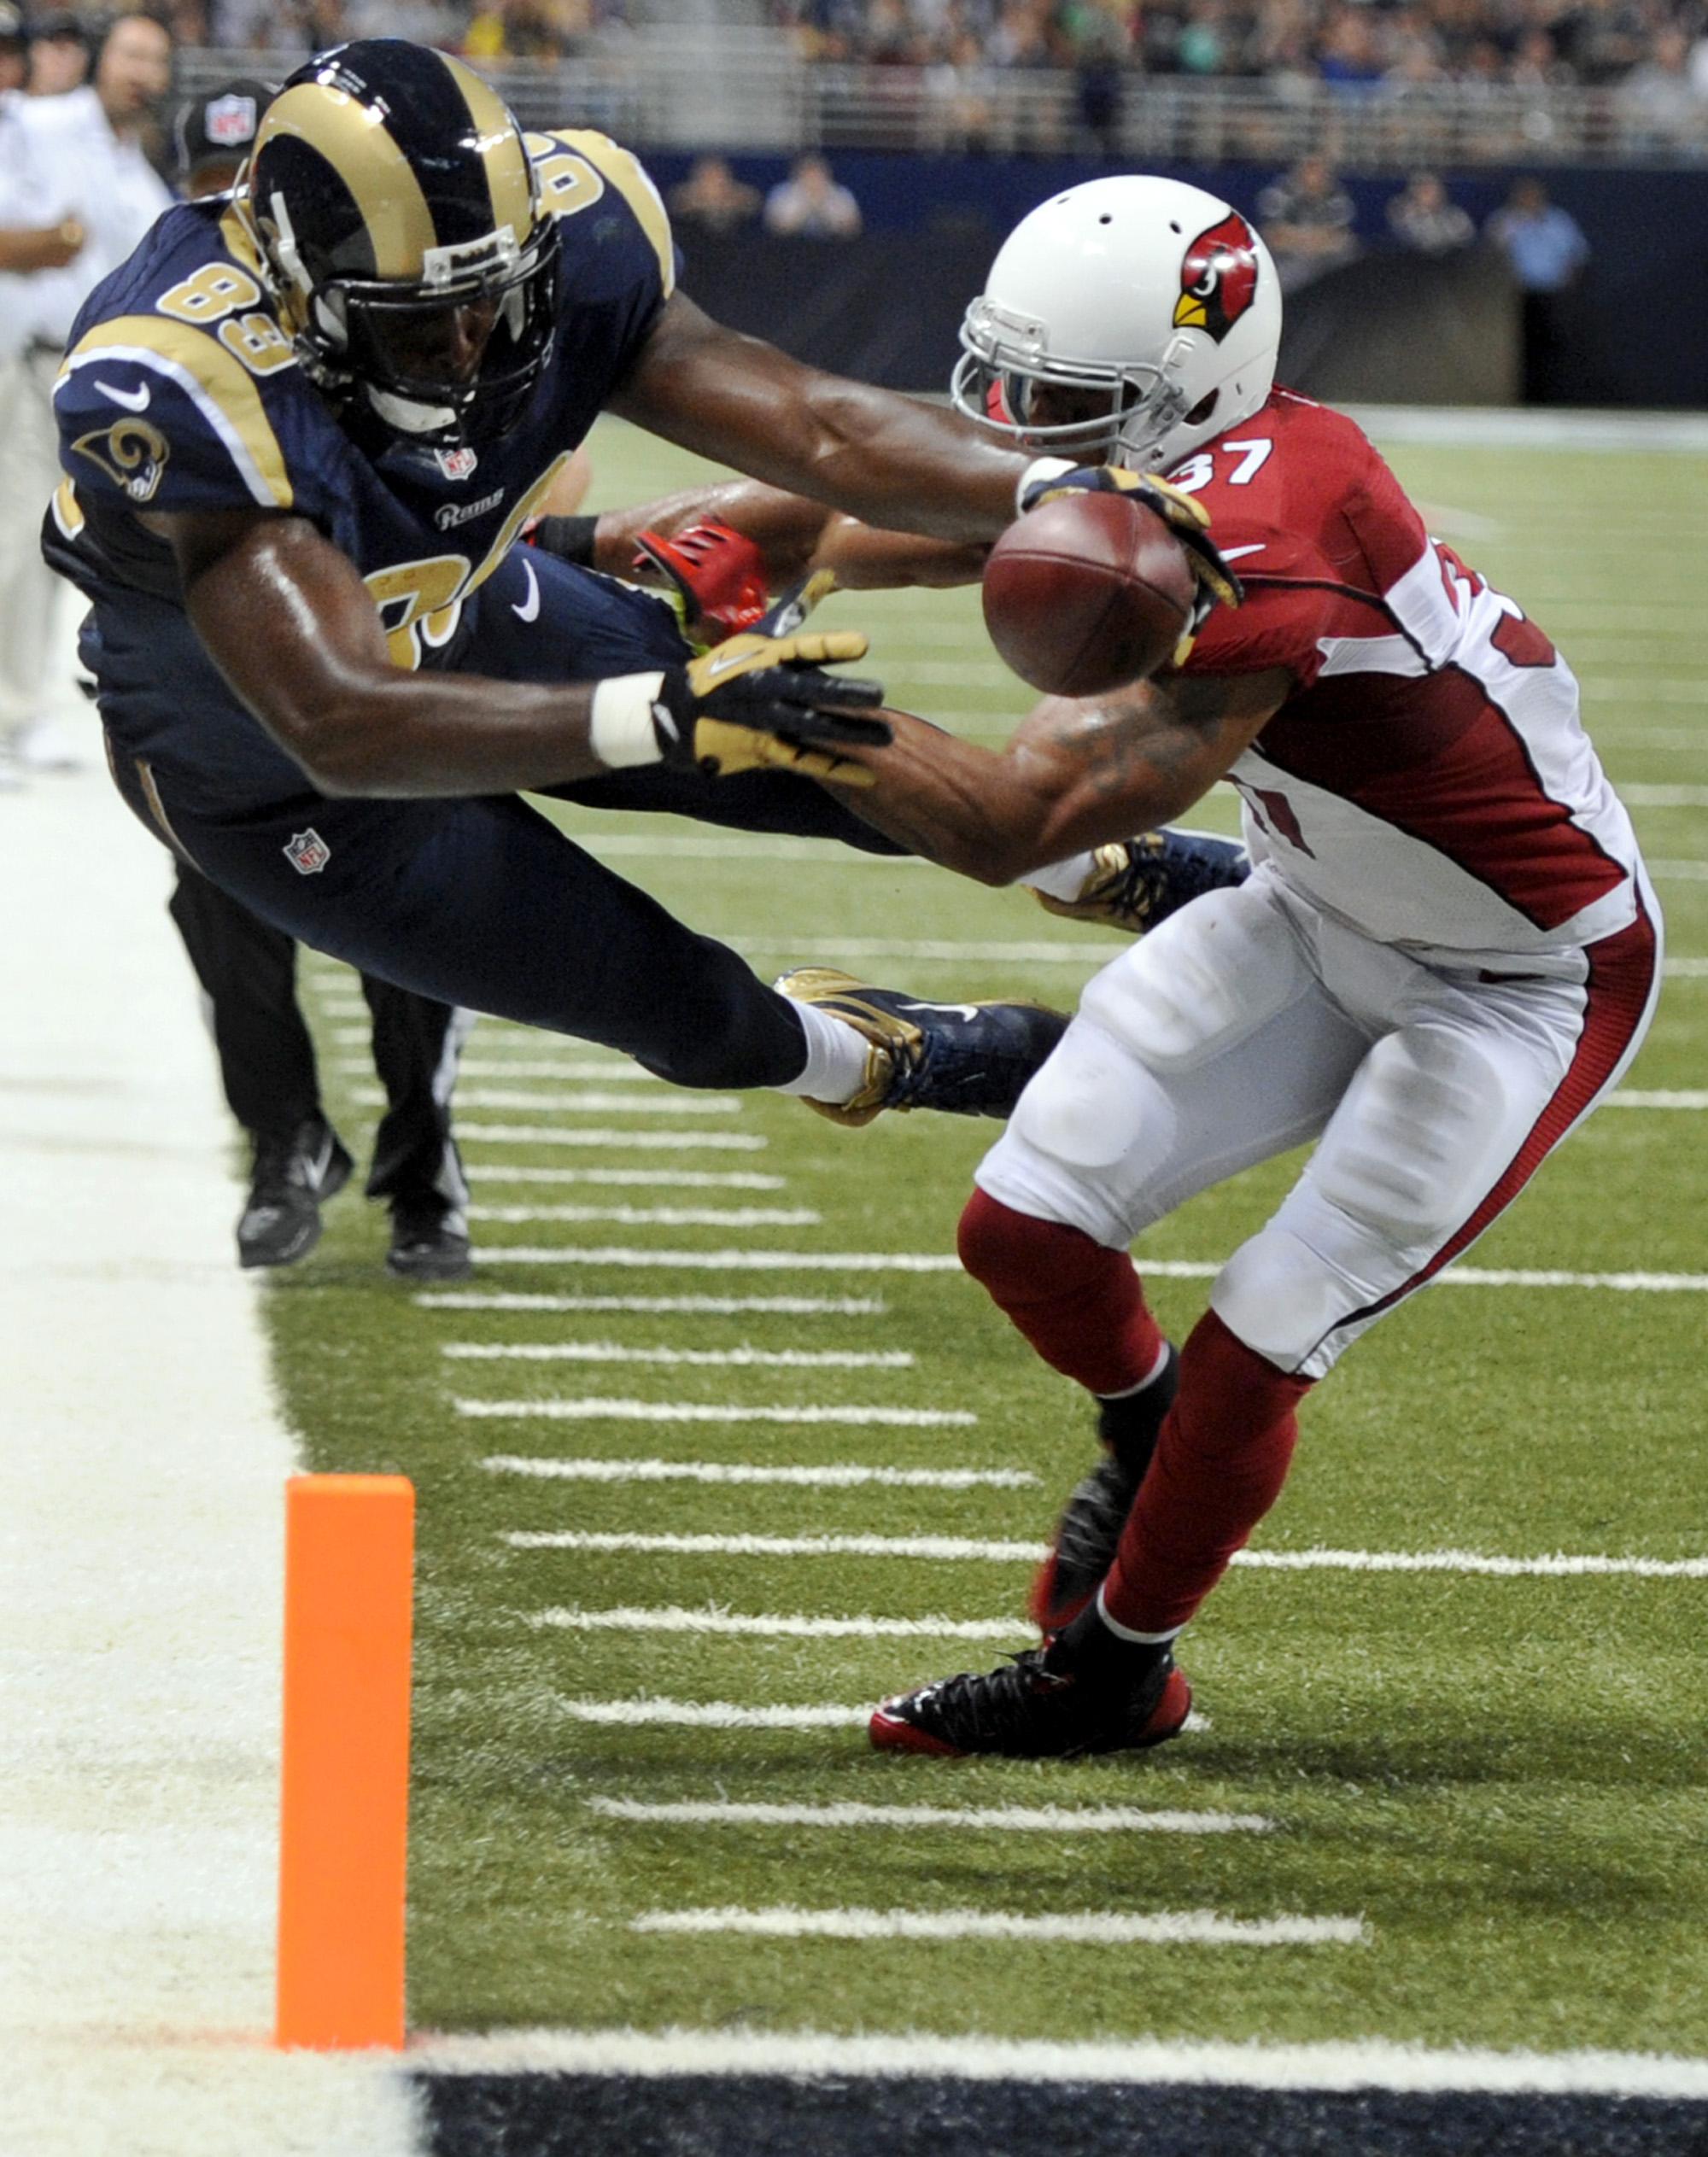 TE Jared Cook coming off huge debut for Rams